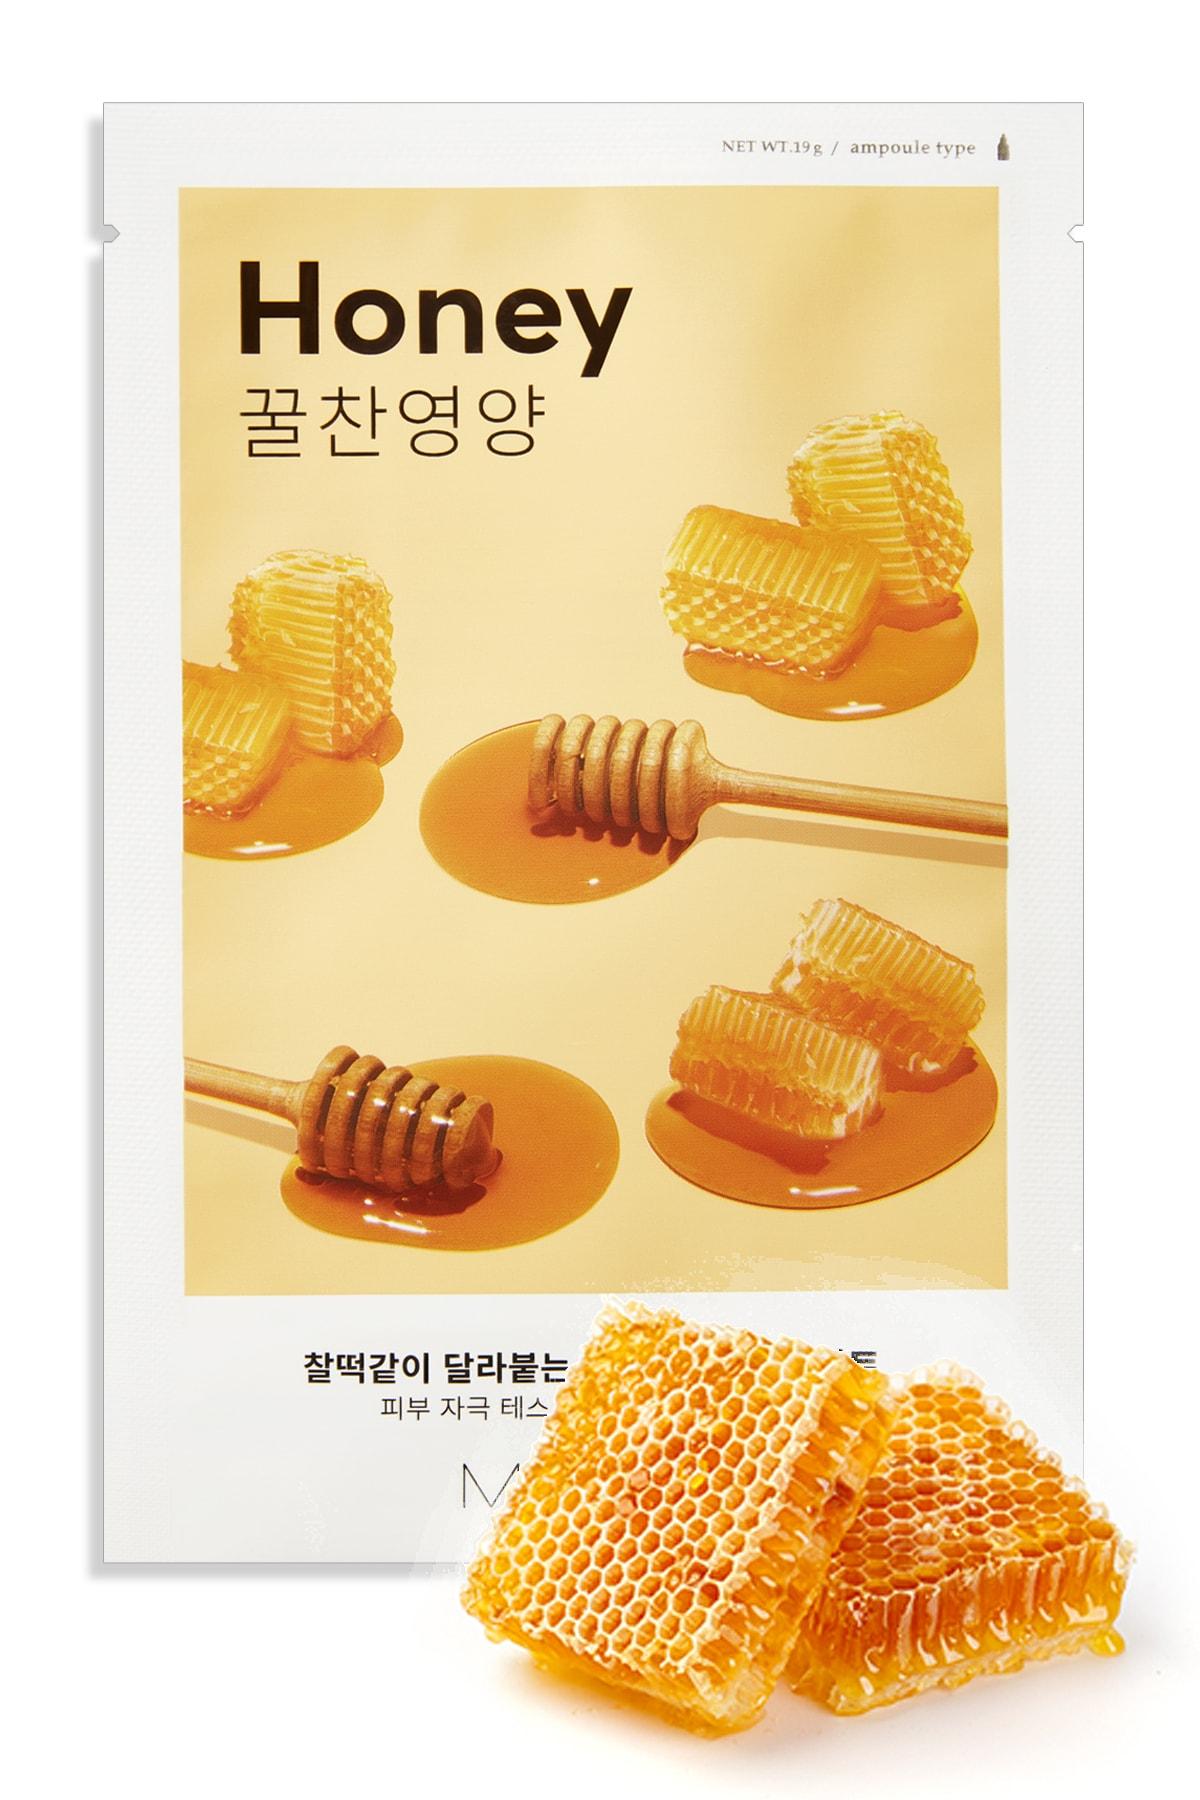 Missha Bal İçerikli Yoğun Nemlendirici Yaprak Maske (1ad) Airy Fit Sheet Mask Honey